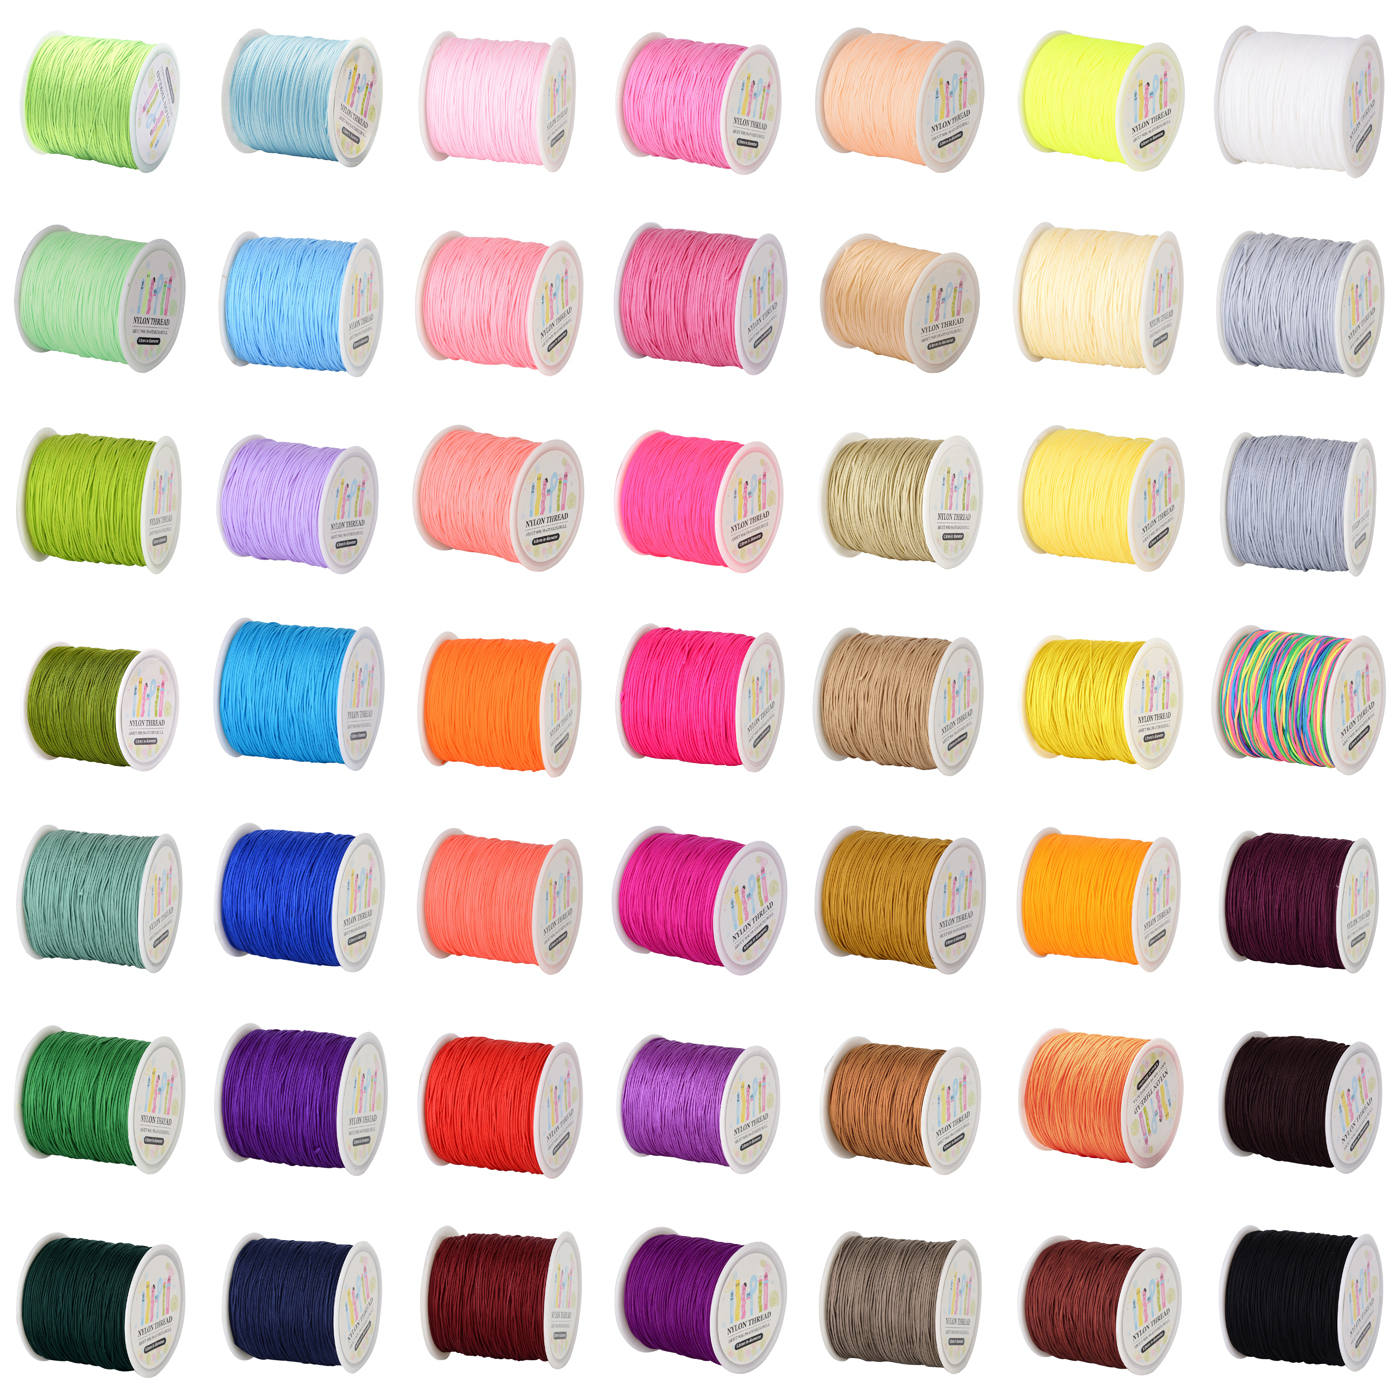 Lt purple or Purple 0.8mm thick nylon cord macrame Beading Kumihimo String 45 Yard Spool Pick Your Color!